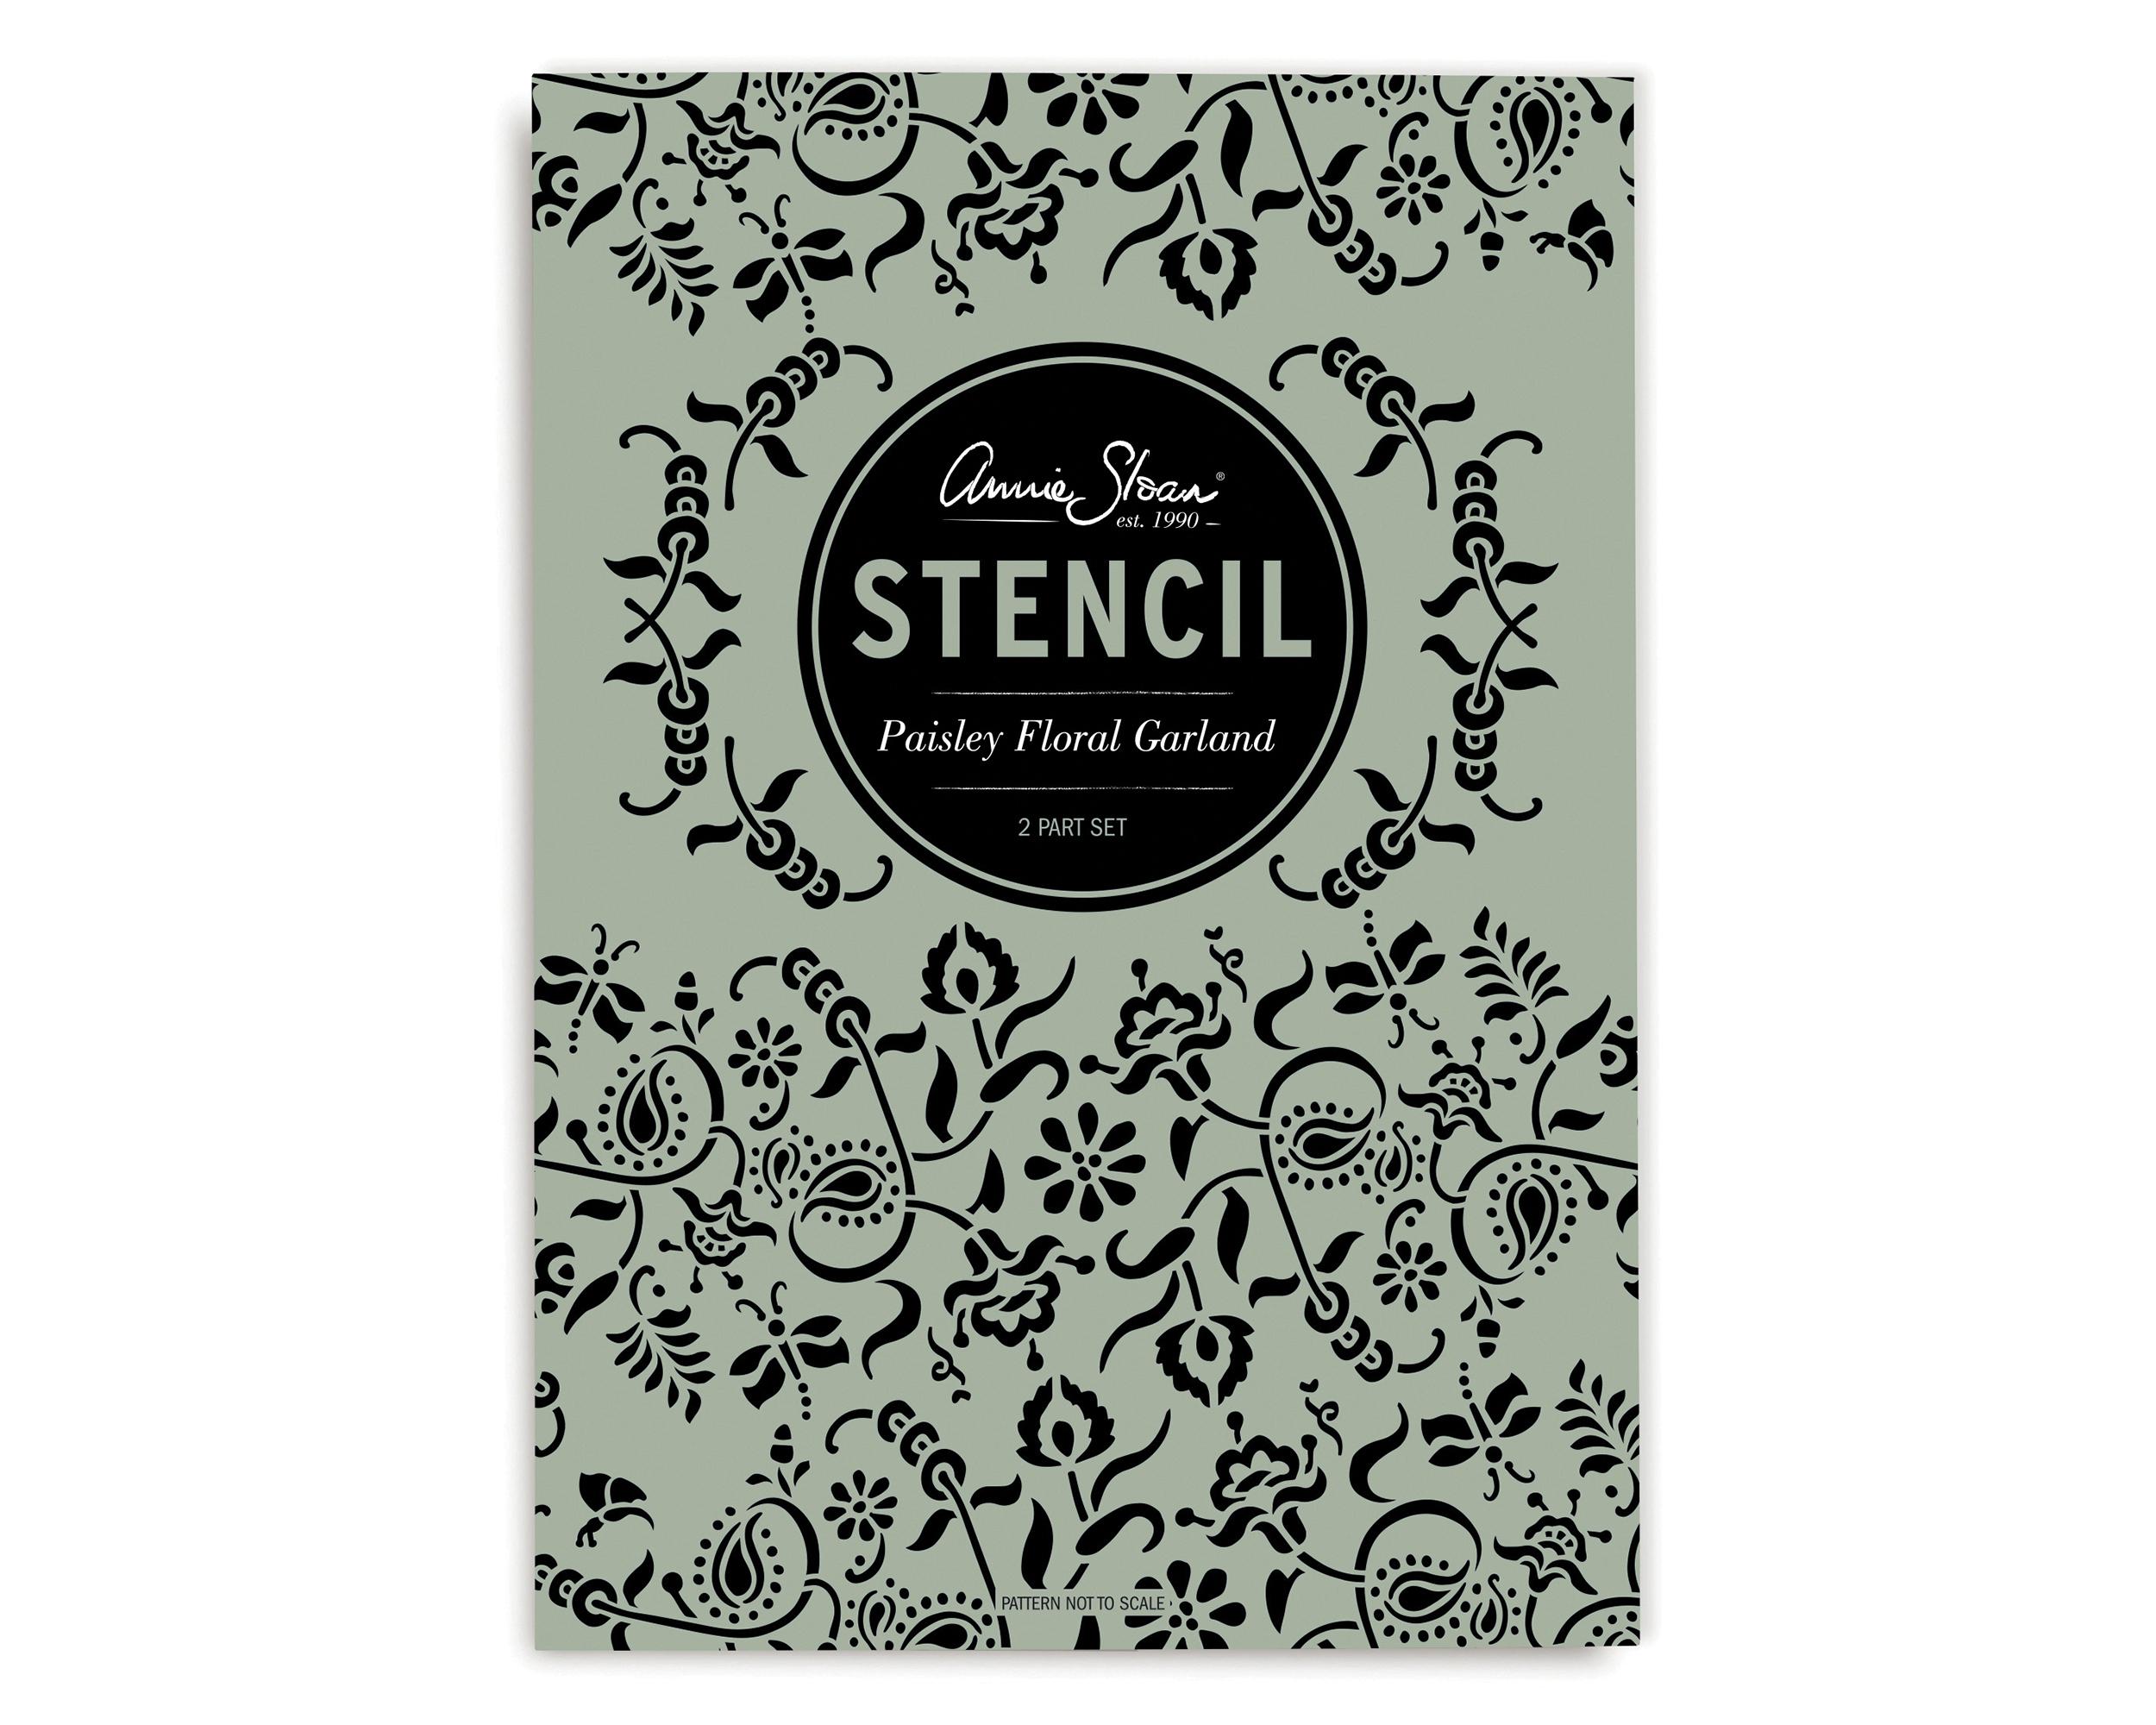 Paisley-Floral-Garland-Annie-Sloan-Stenc